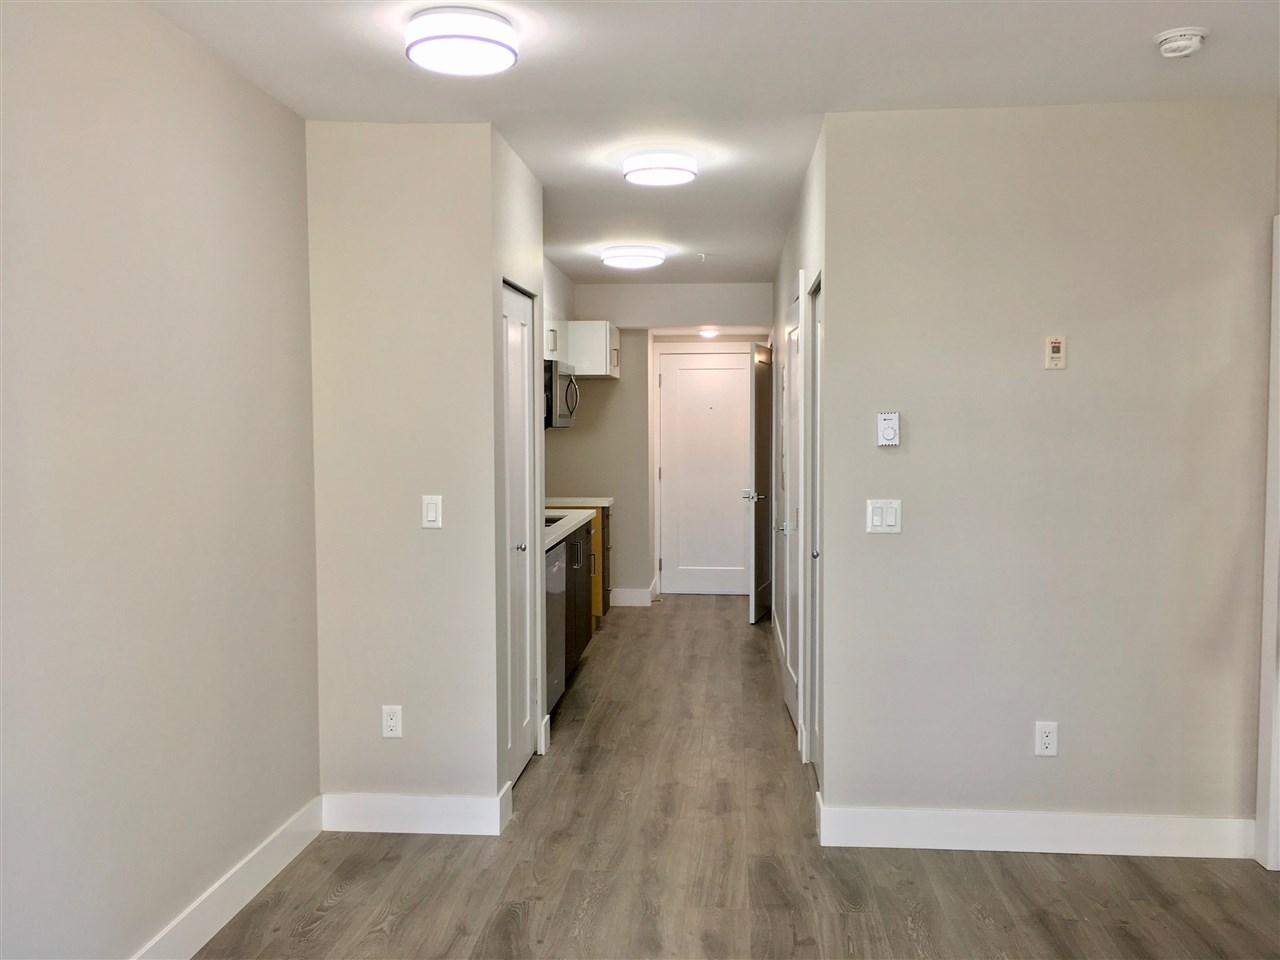 Condo Apartment at 207 3939 KNIGHT STREET, Unit 207, Vancouver East, British Columbia. Image 4